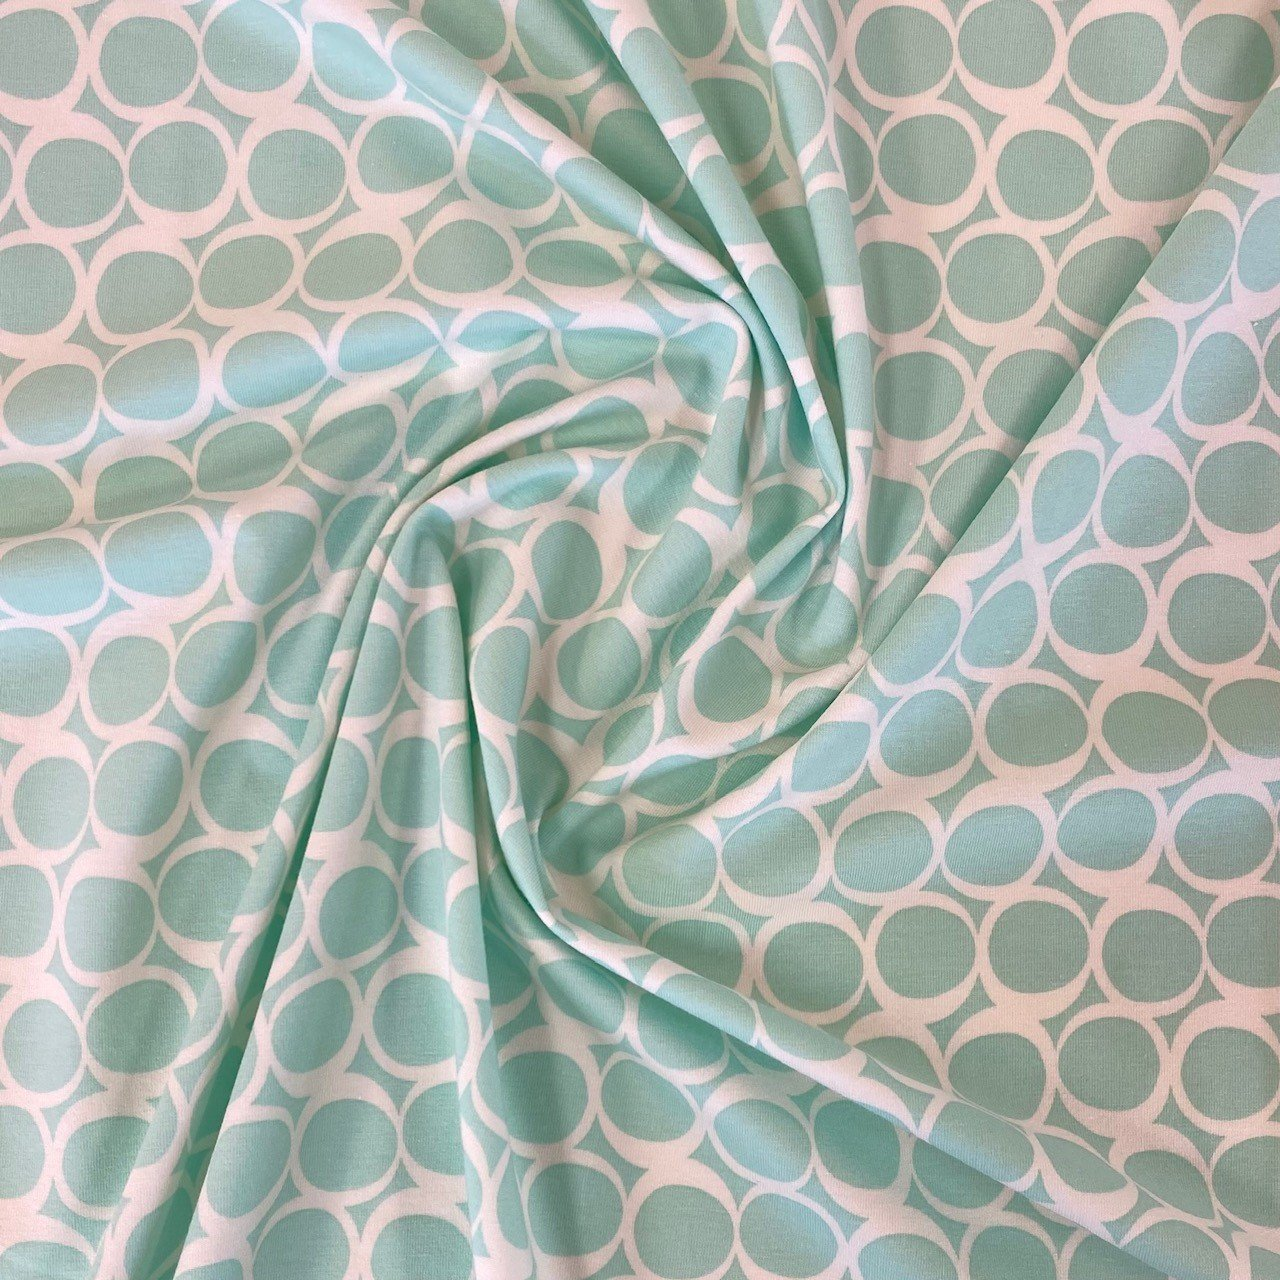 Seafoam Swirls Knit